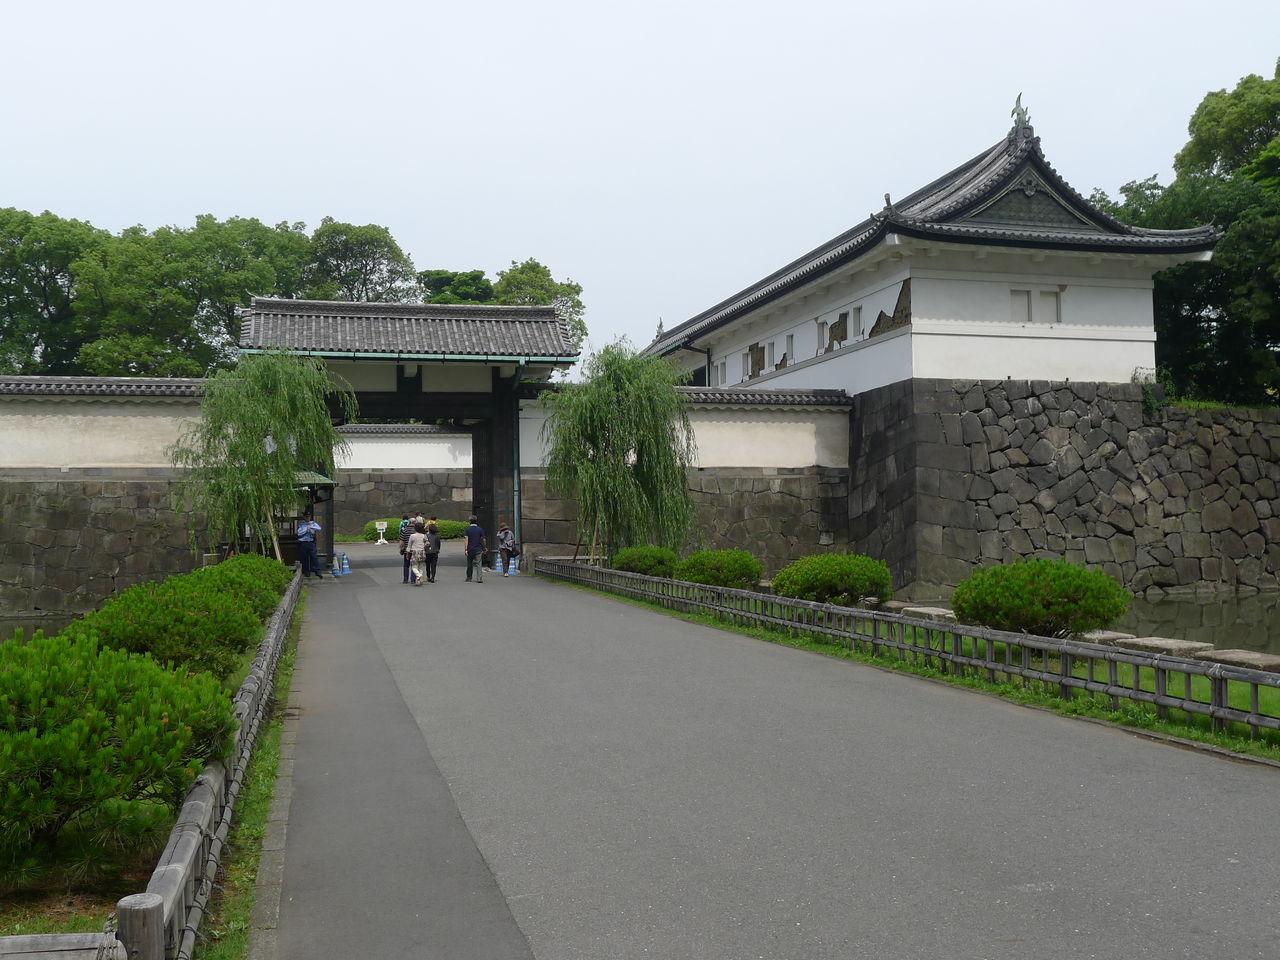 Allegrettoな風景:皇居東御苑・大手門 - livedoor Blog(ブログ)